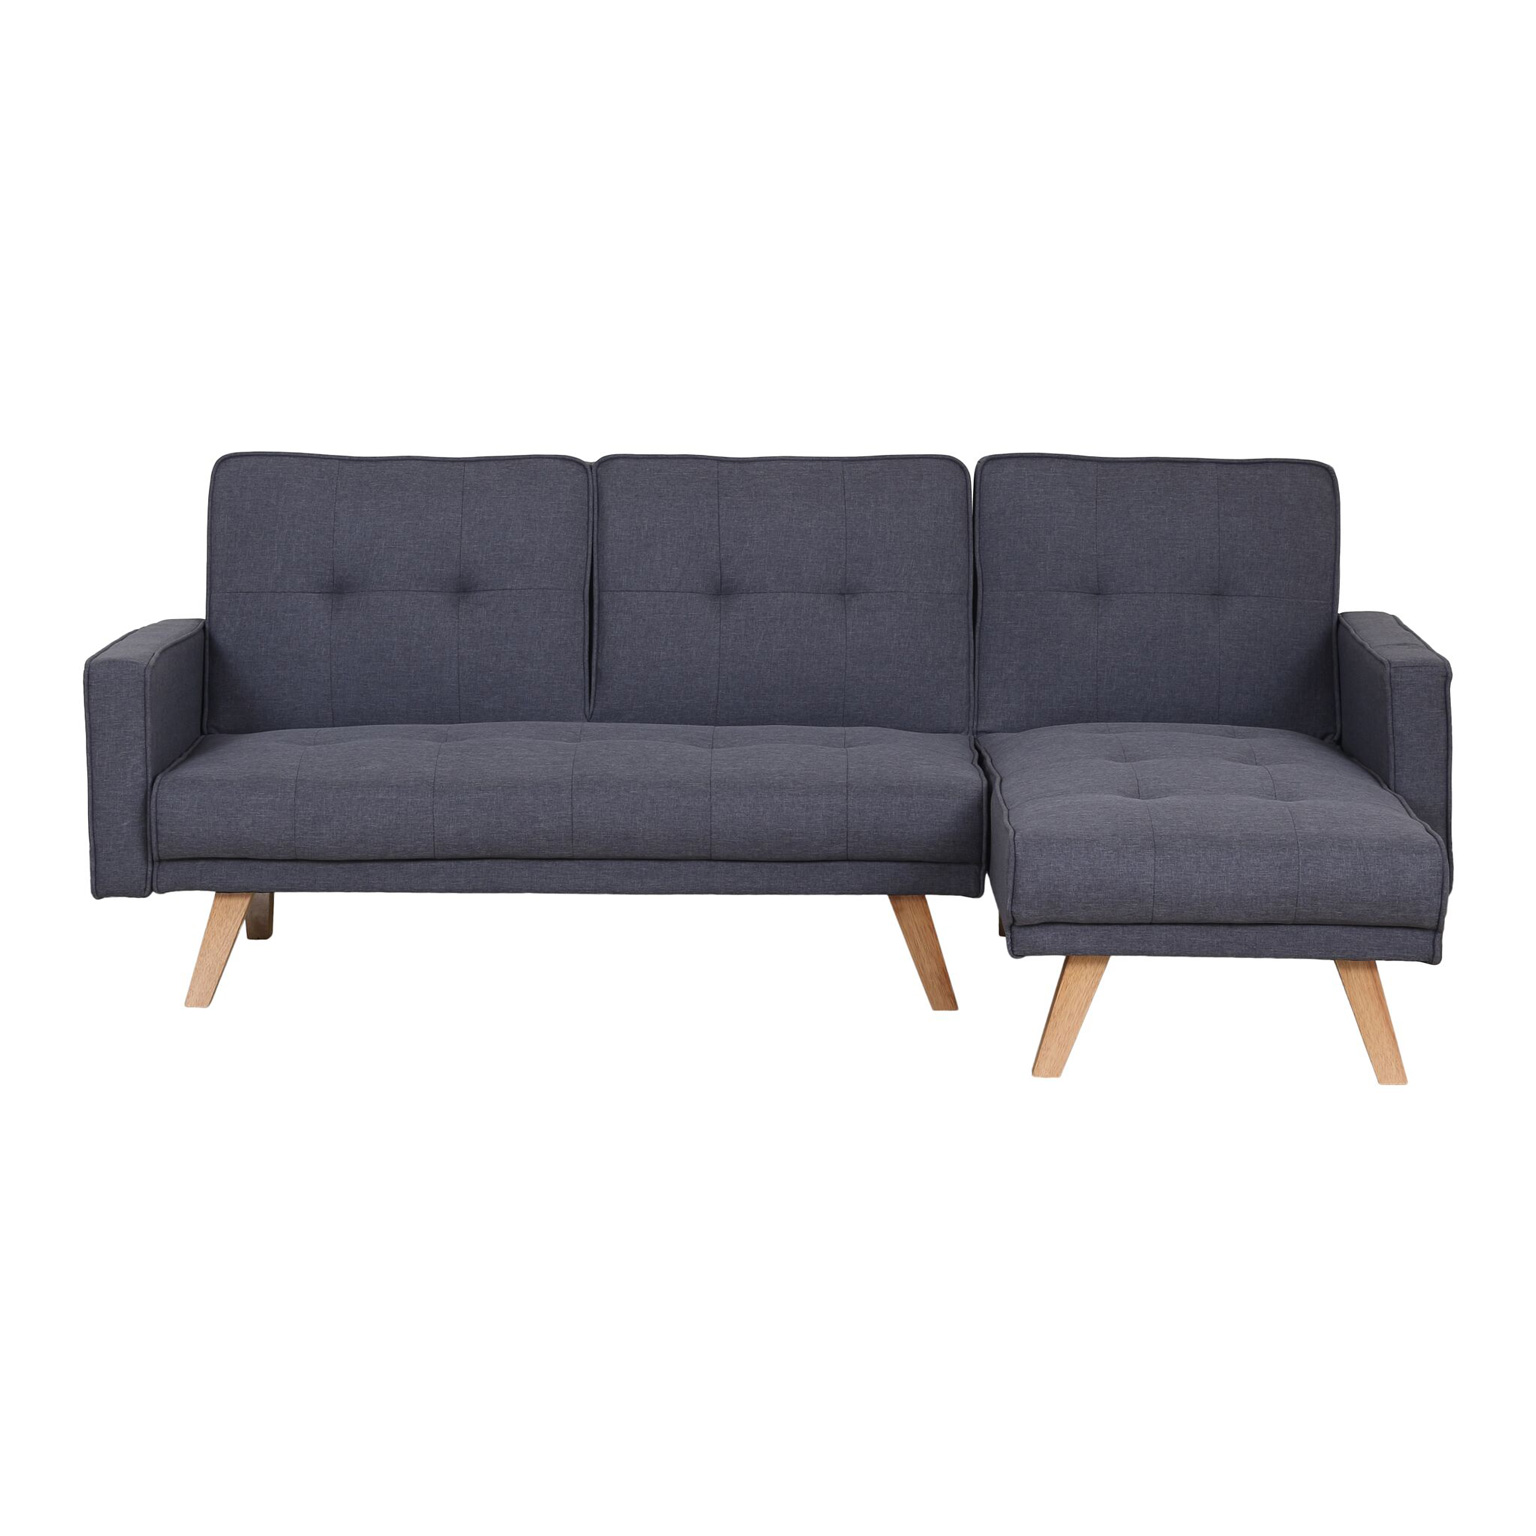 Kitson L Shaped Sofa Bed 3